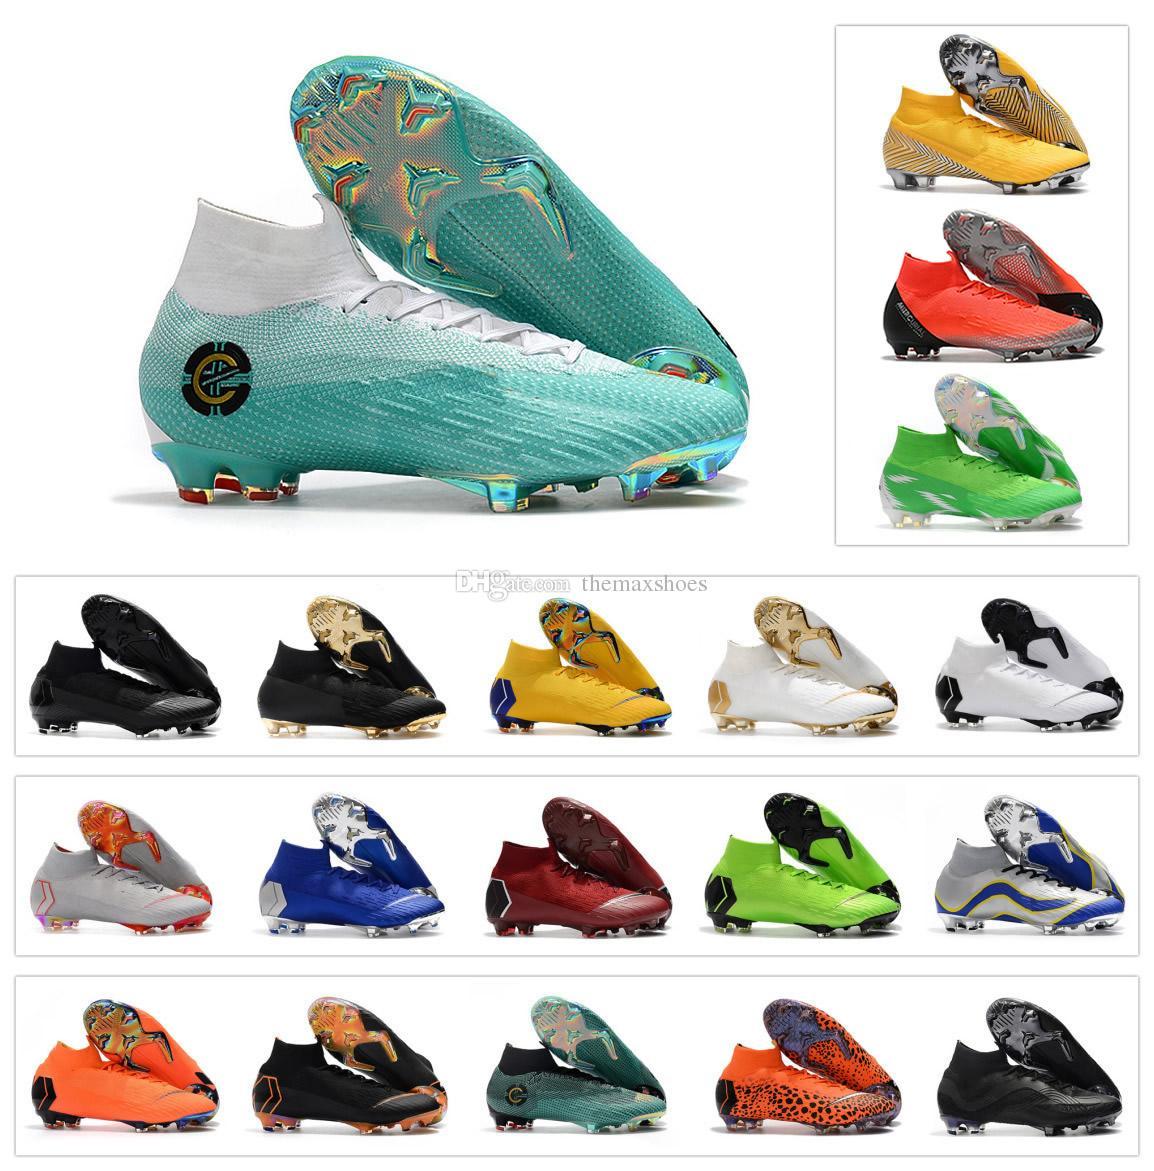 3867ac3a09e 2019 Hot Mercurial Superfly VI 360 Elite FG KJ 6 XII 12 CR7 Ronaldo Neymar  NJR Mens Women Boys High Ankle Soccer Shoes Football Boots Cleats From ...